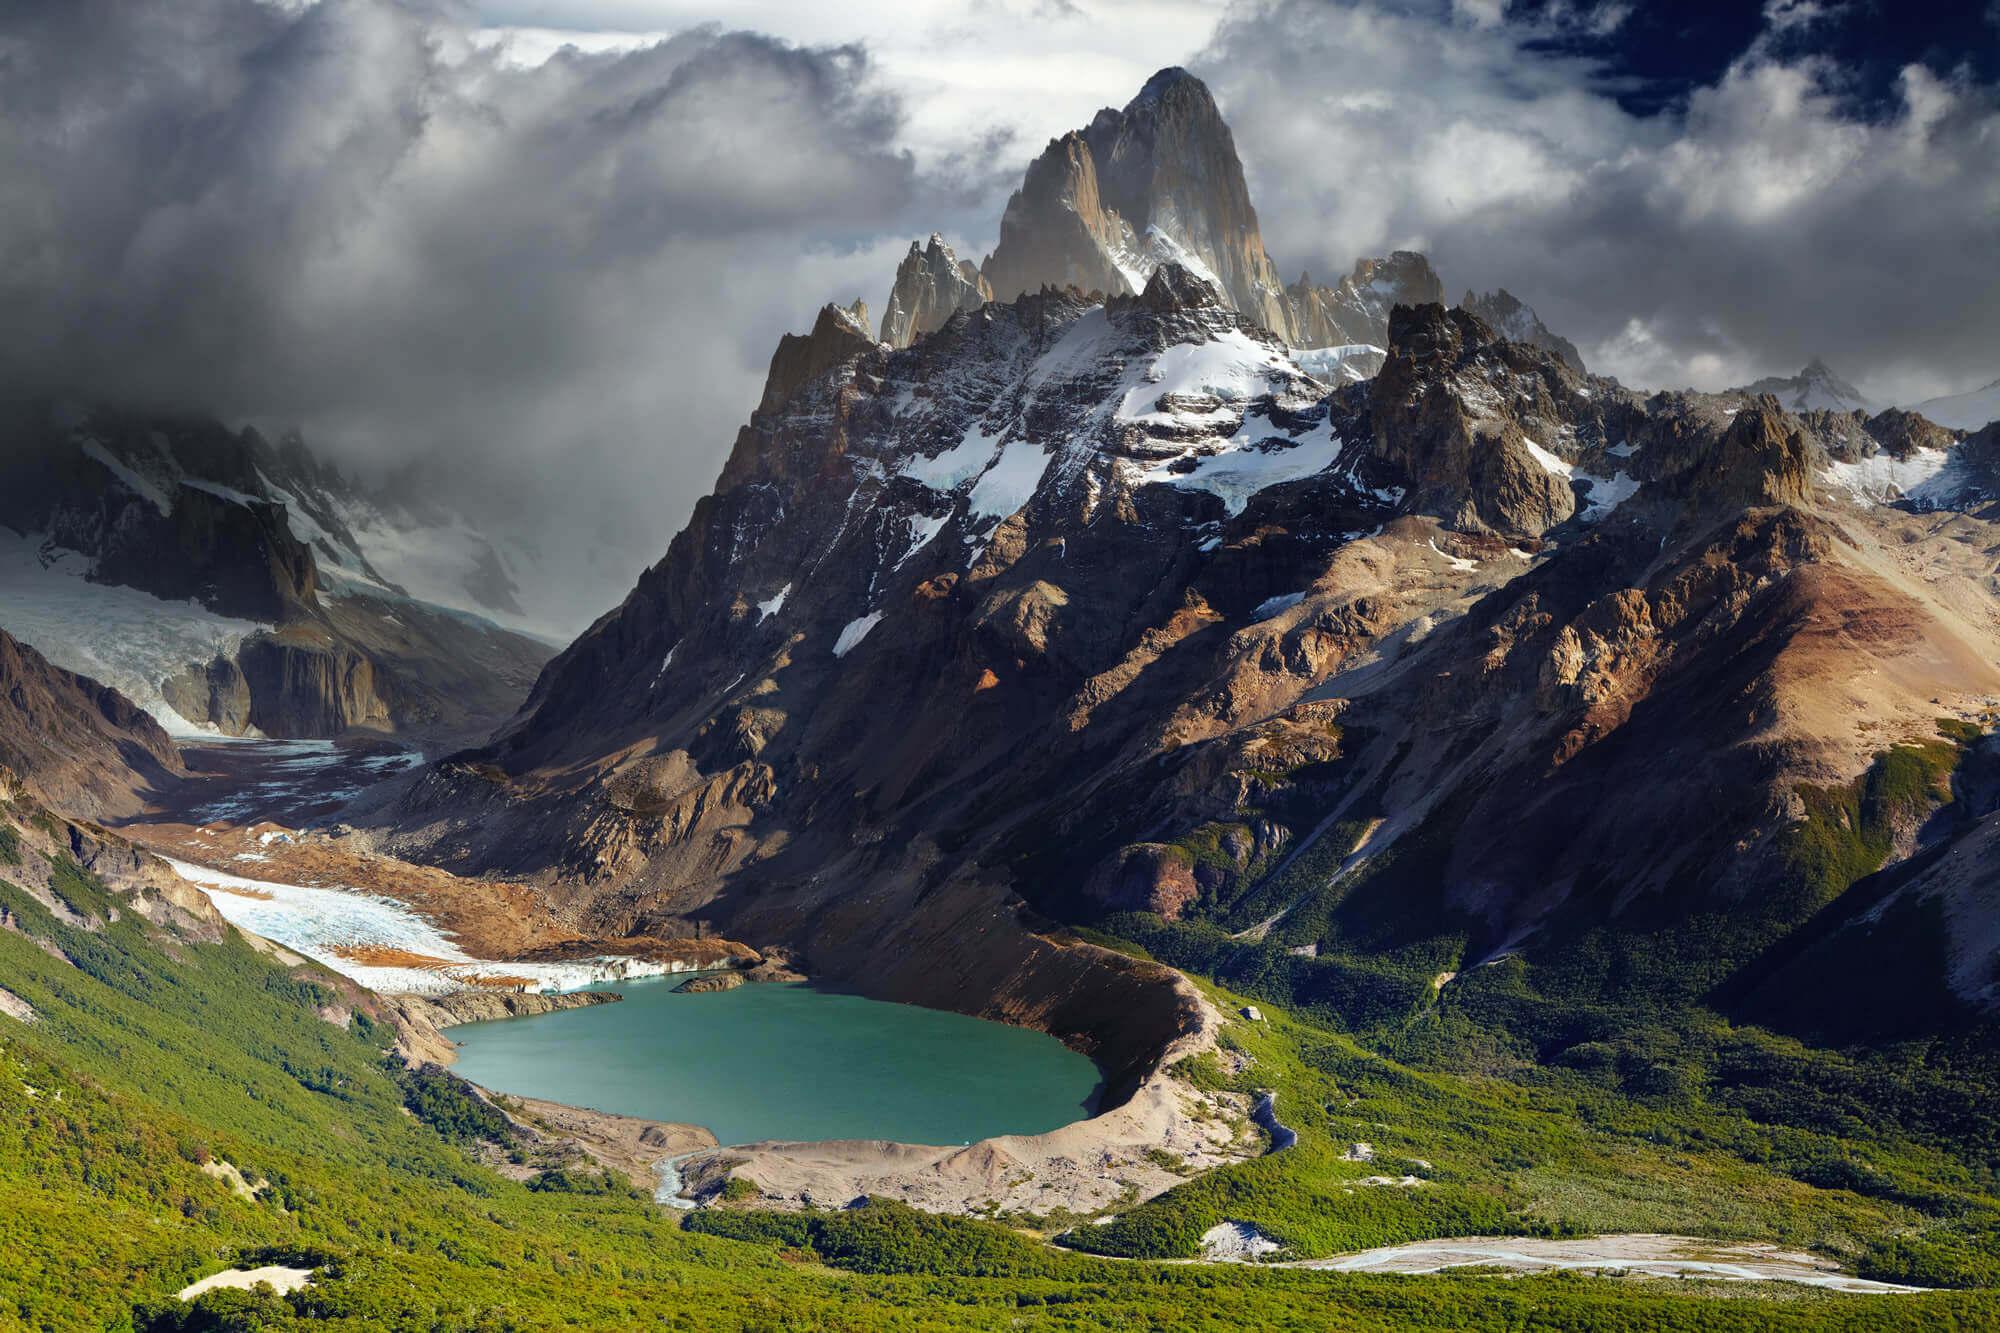 Mount Fitz Roy and Laguna Torre, Patagonia